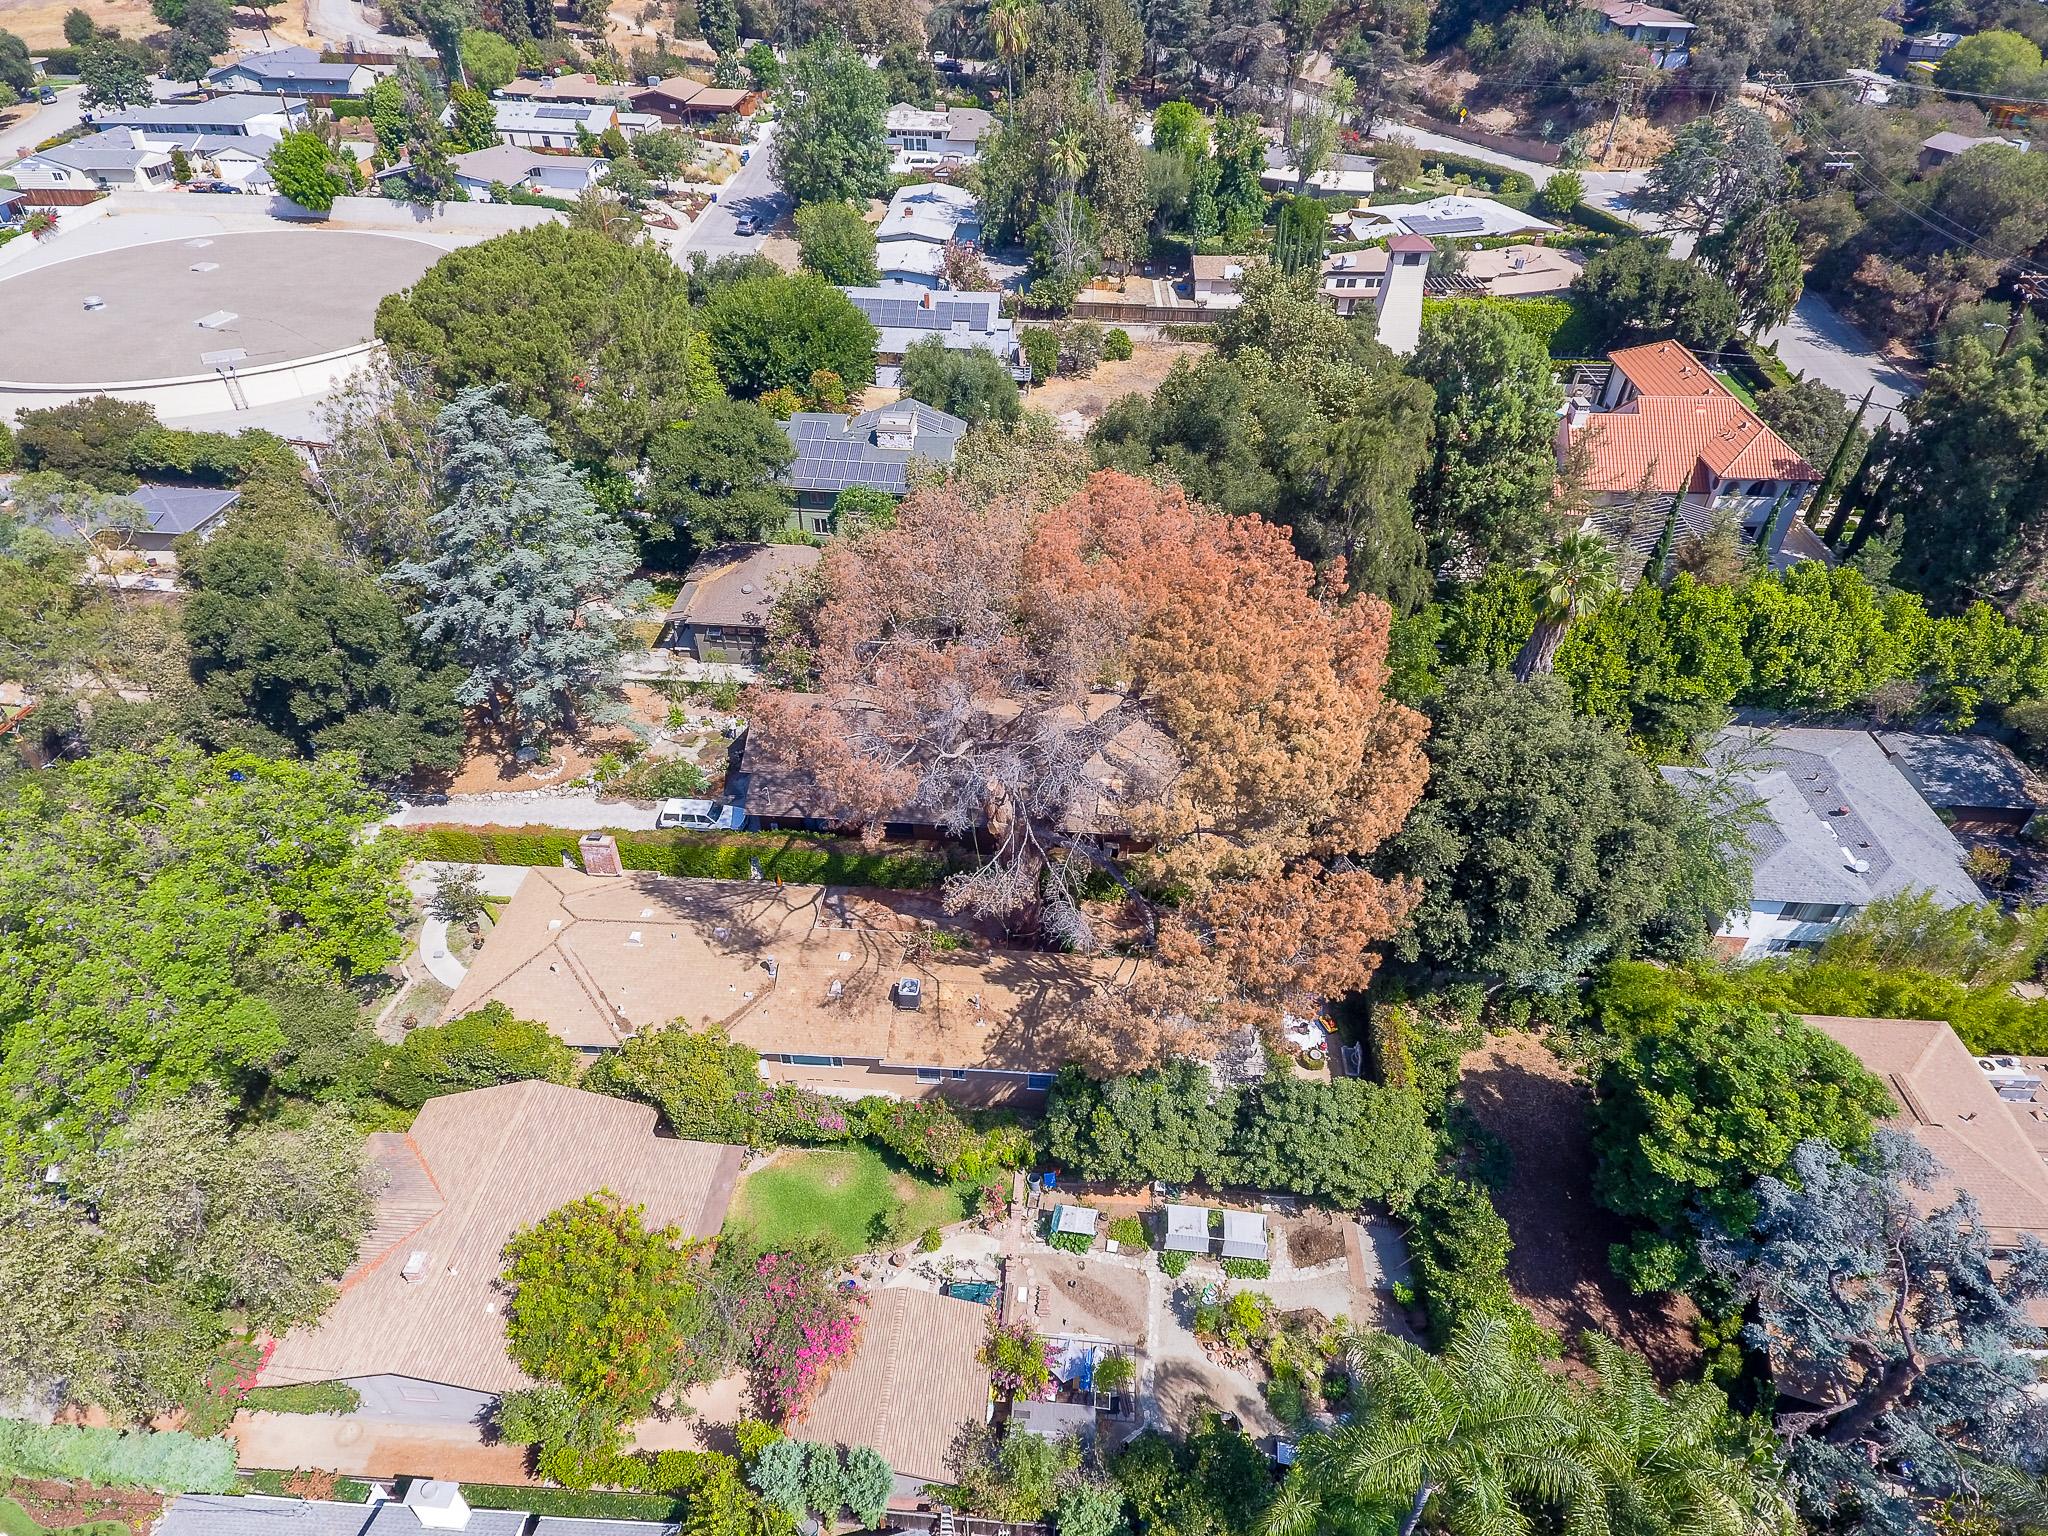 Mariposa Tree Removal Aerial 2-19.jpg